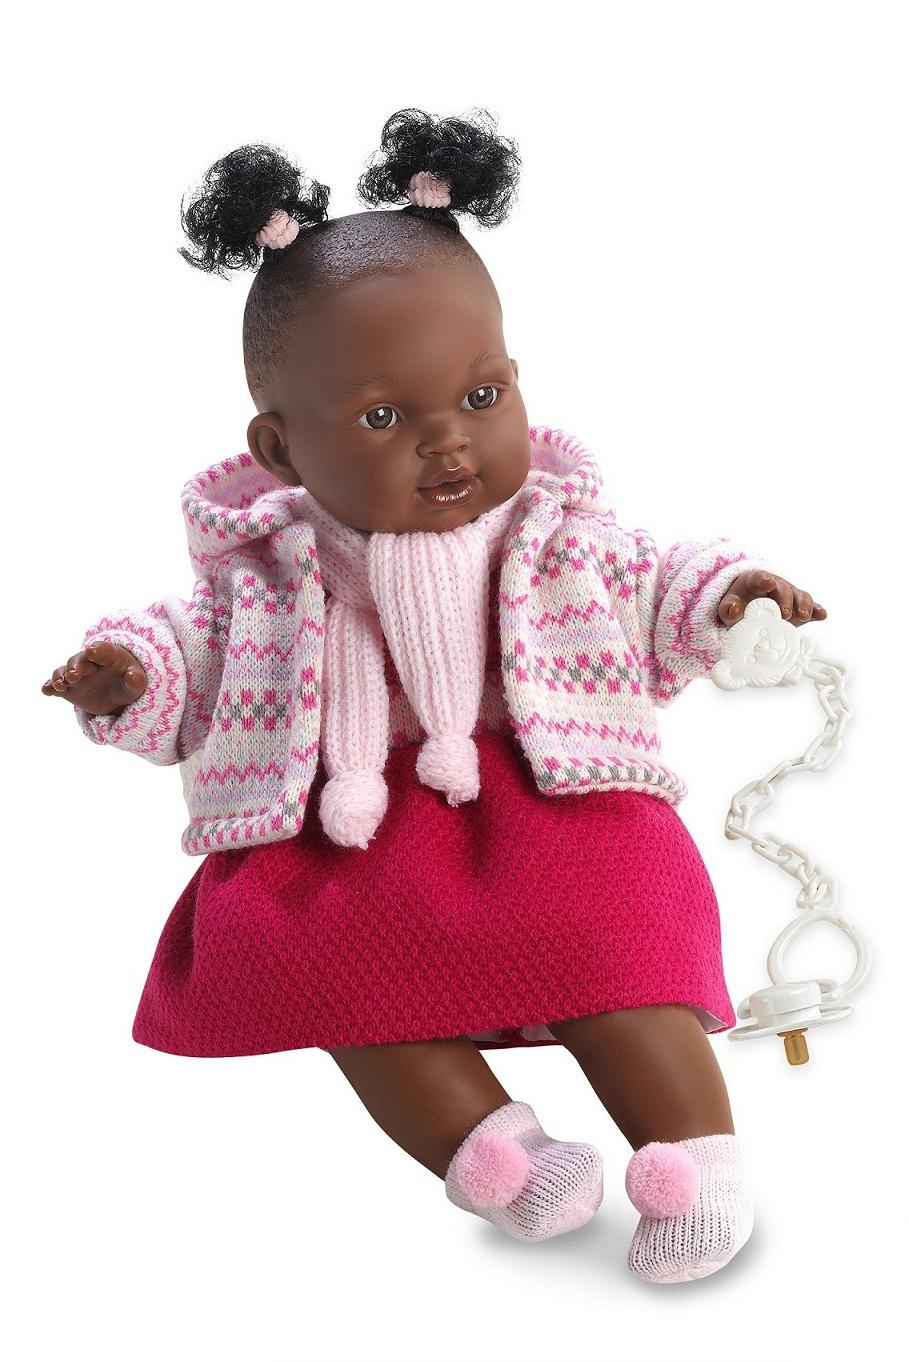 Кукла Эдис 38 смИспанские куклы Llorens Juan, S.L.<br>Кукла Эдис 38 см<br>